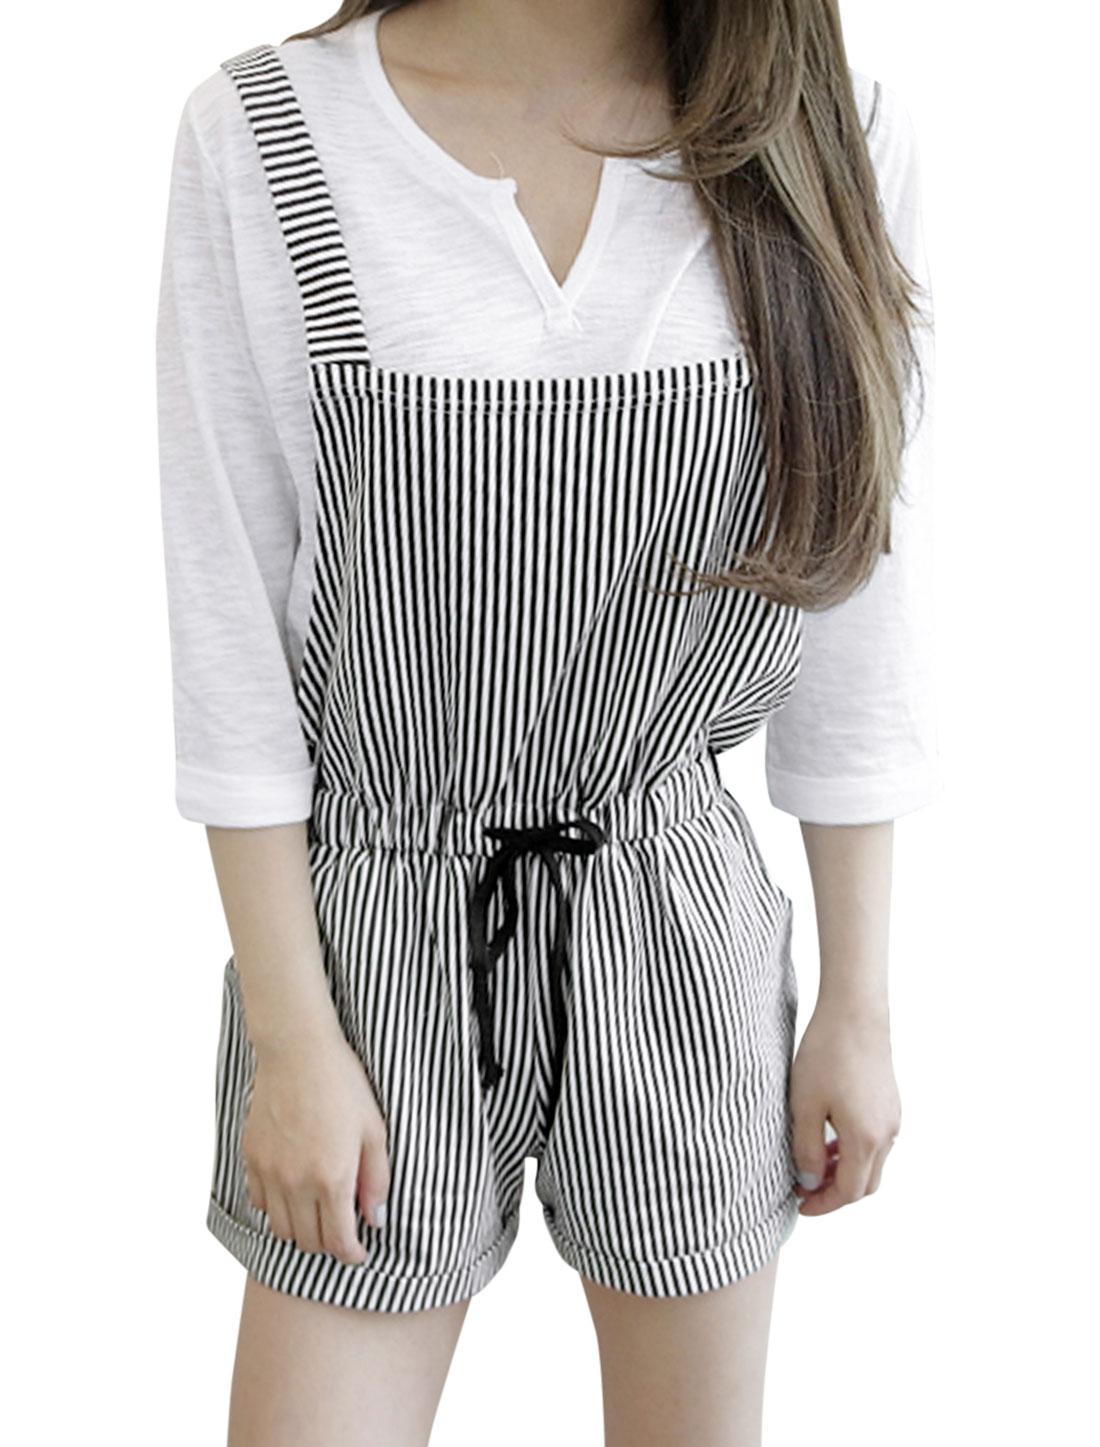 Lady Elastic Waist Roll-up Hem Slant Pockets Striped Suspender Shorts Black White XS